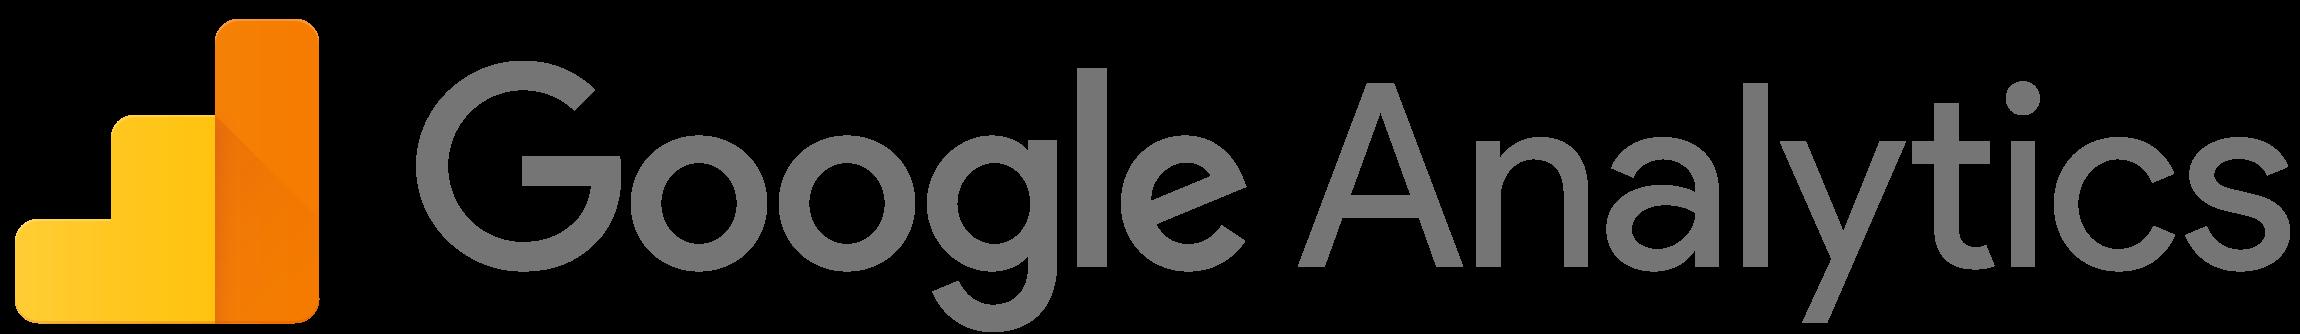 Astroglide uses Zesty.io and Google Analytics Integration